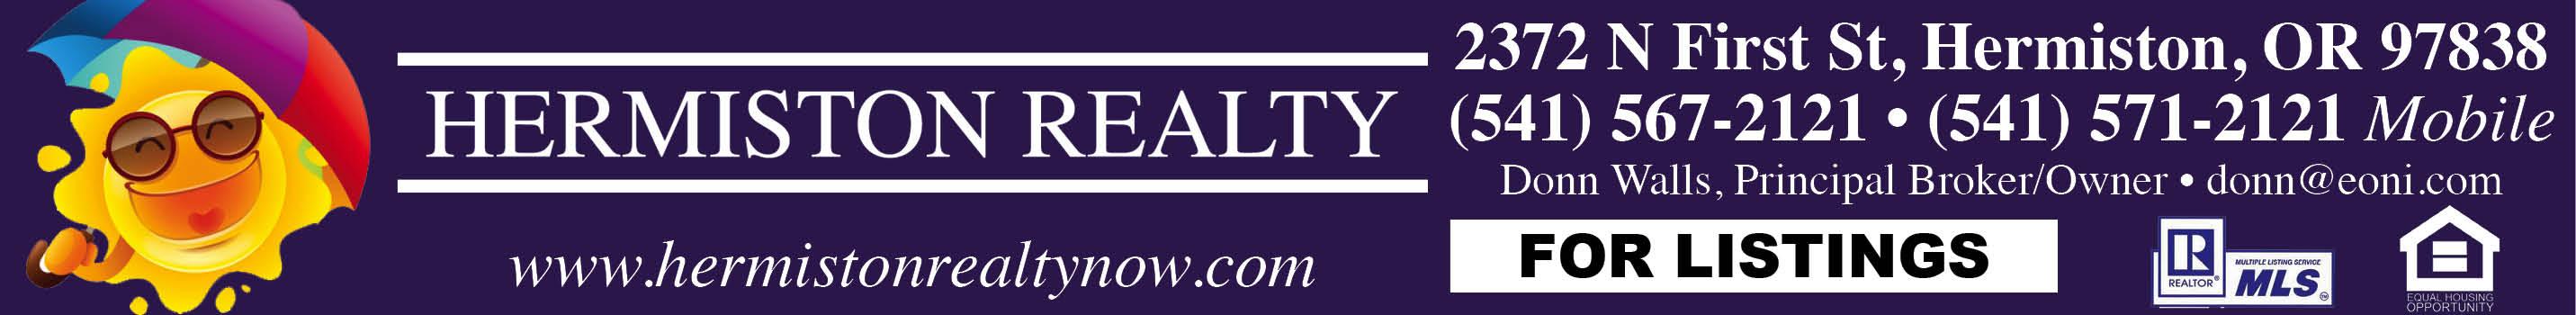 Hermiston Realty 1 10-31-16 (118)